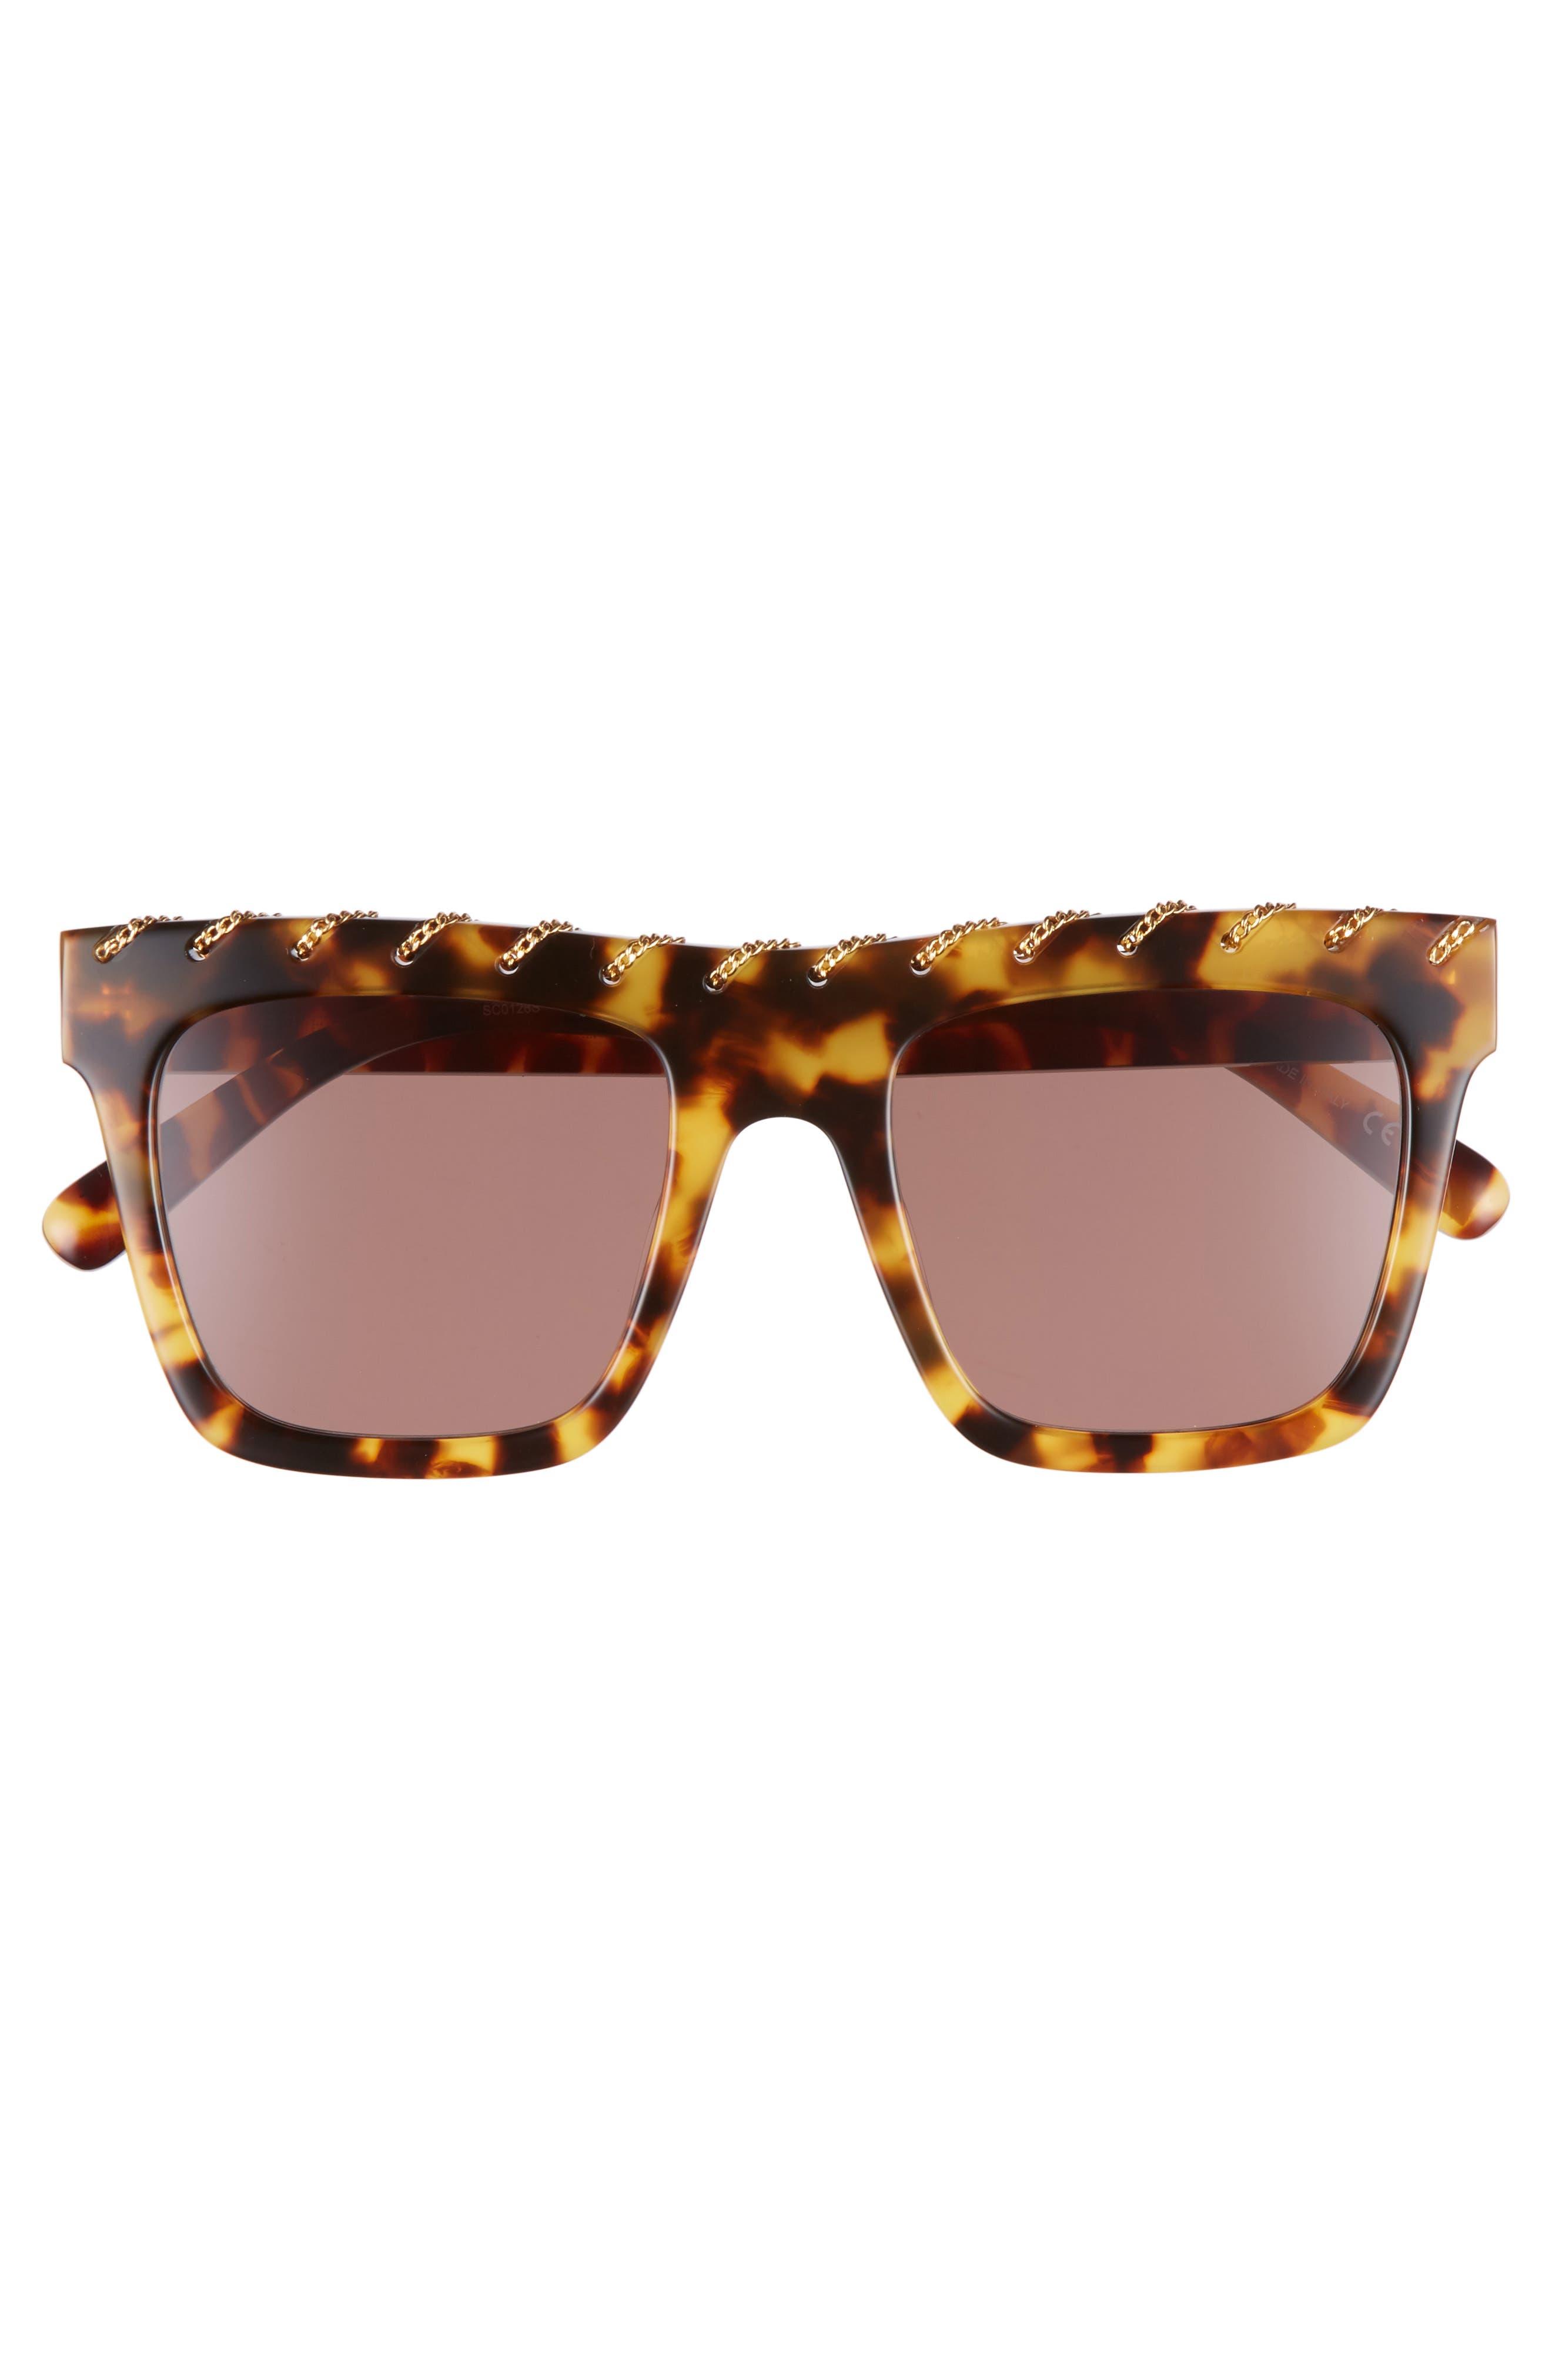 51mm Chain Detail Square Sunglasses,                             Alternate thumbnail 3, color,                             Medium Havana/ Gold